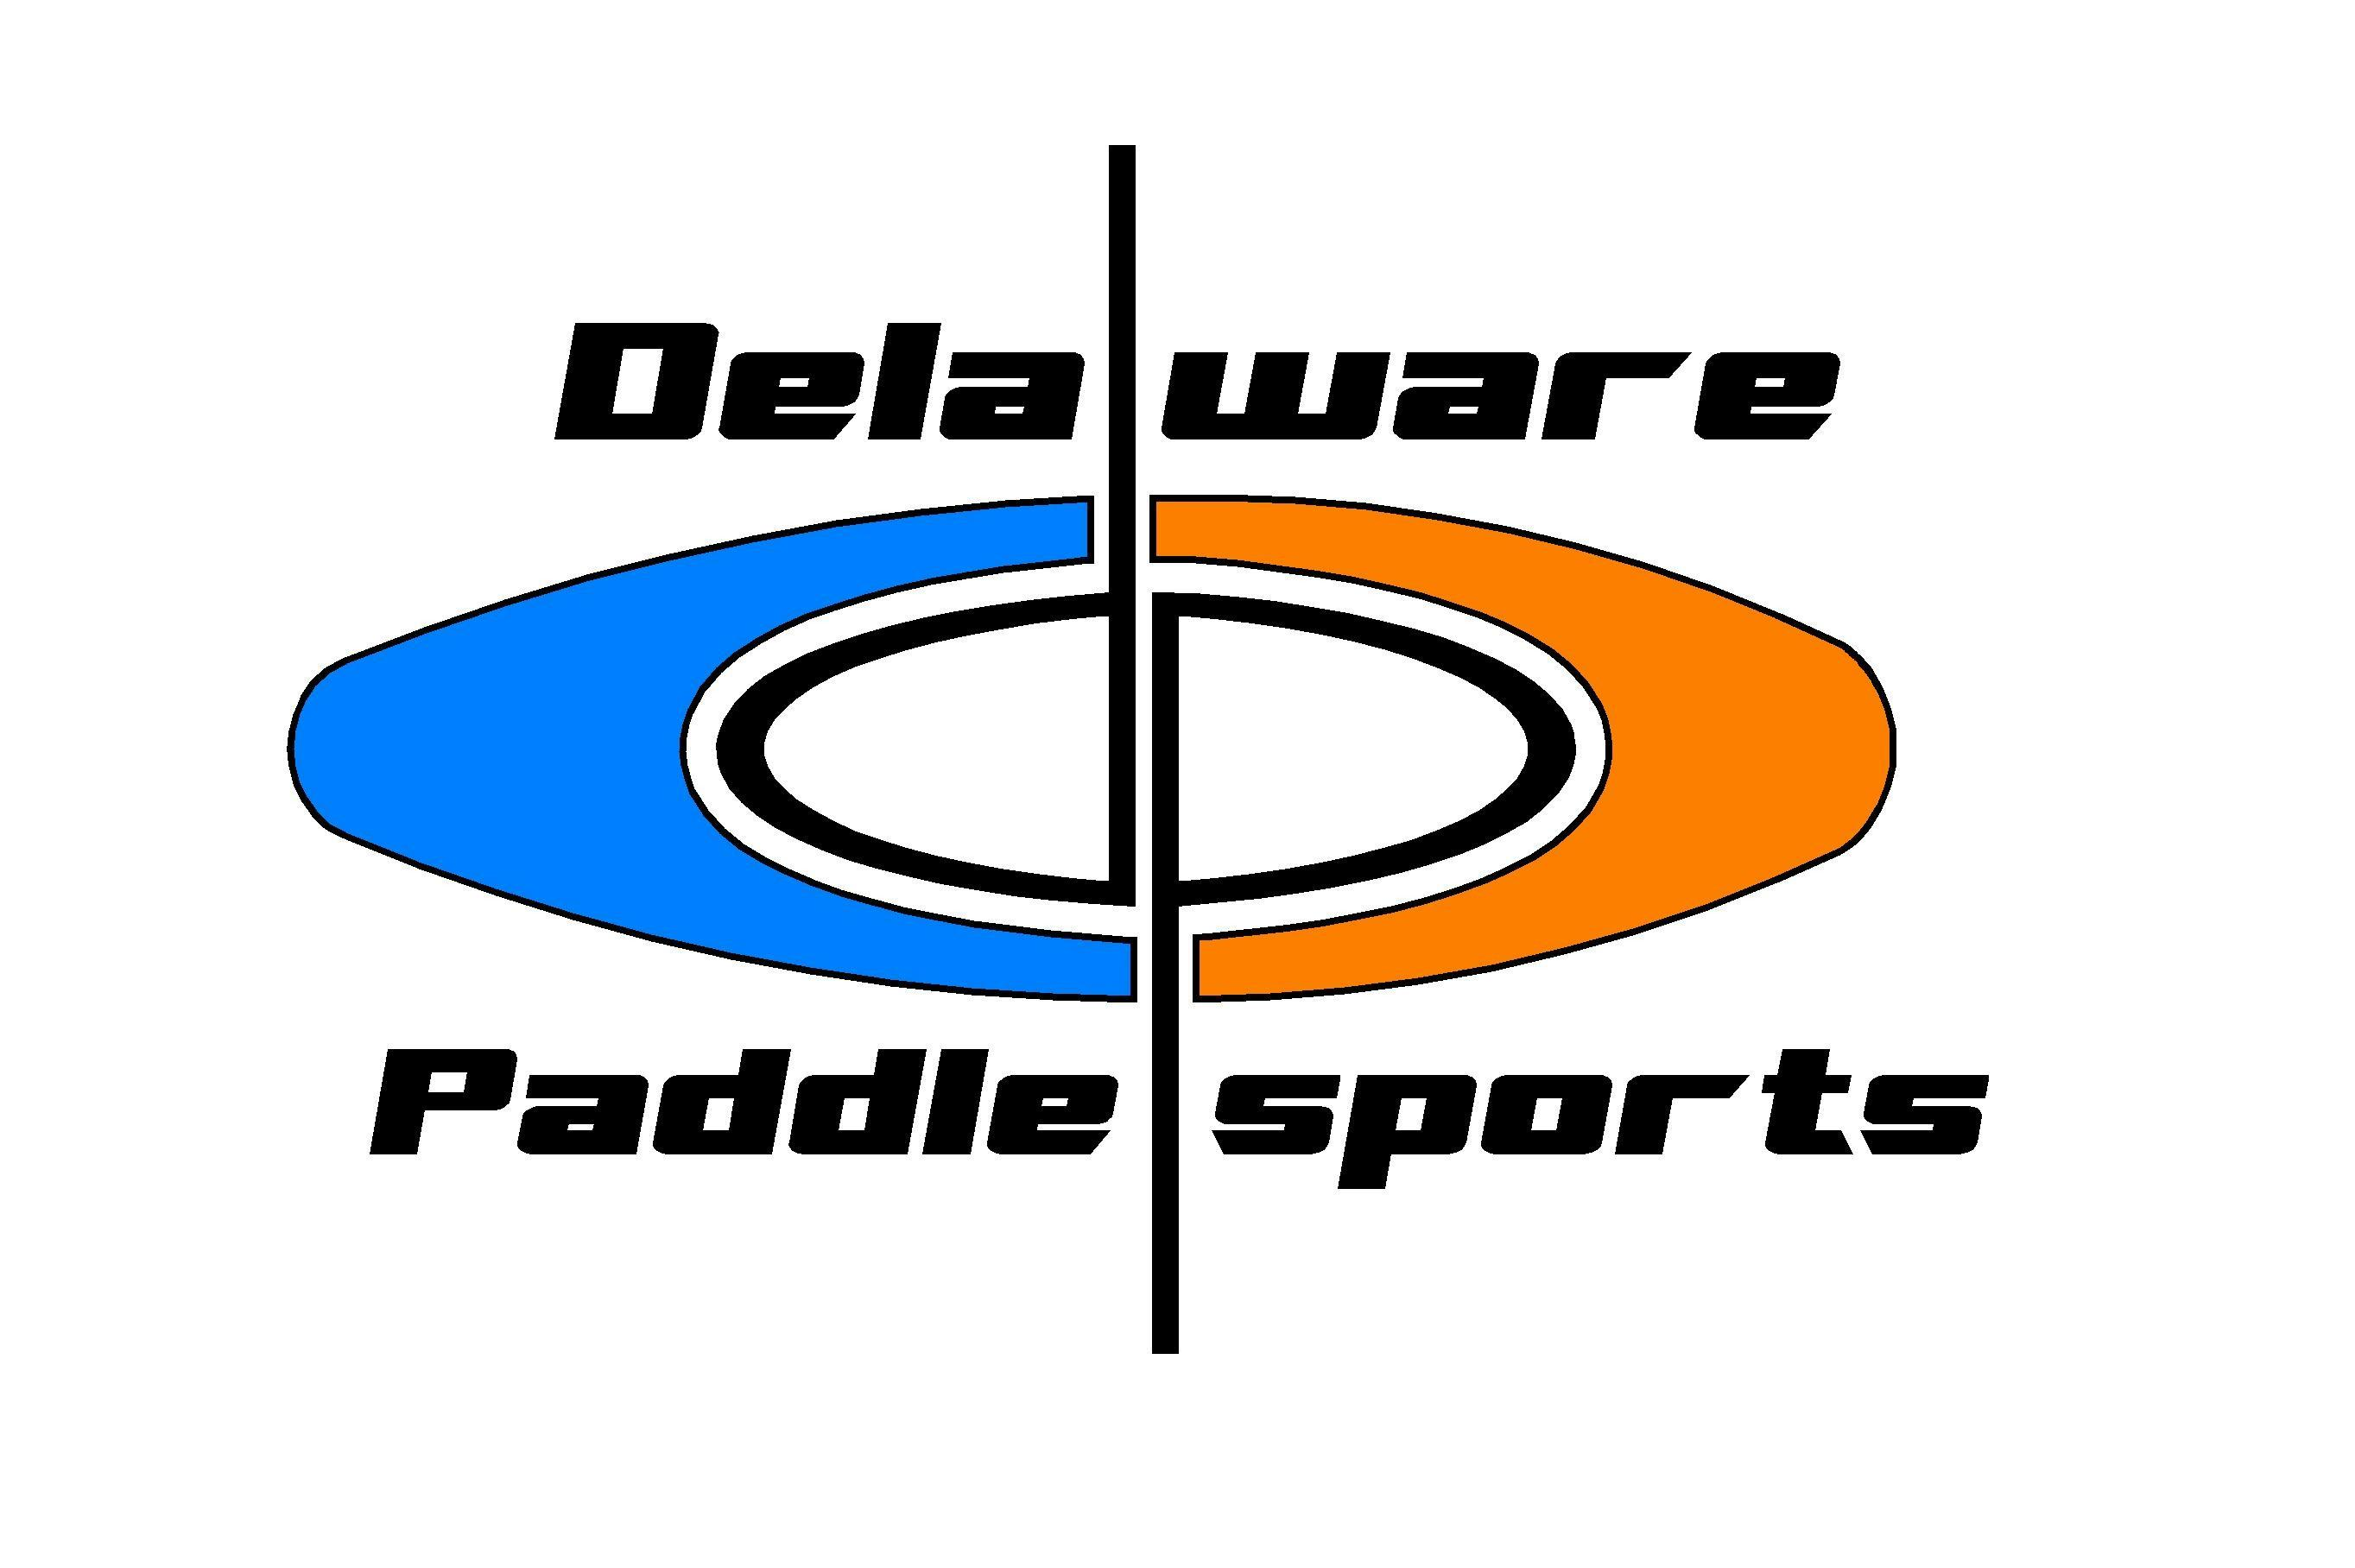 paddlesports-logo-2727x1816-.jpg